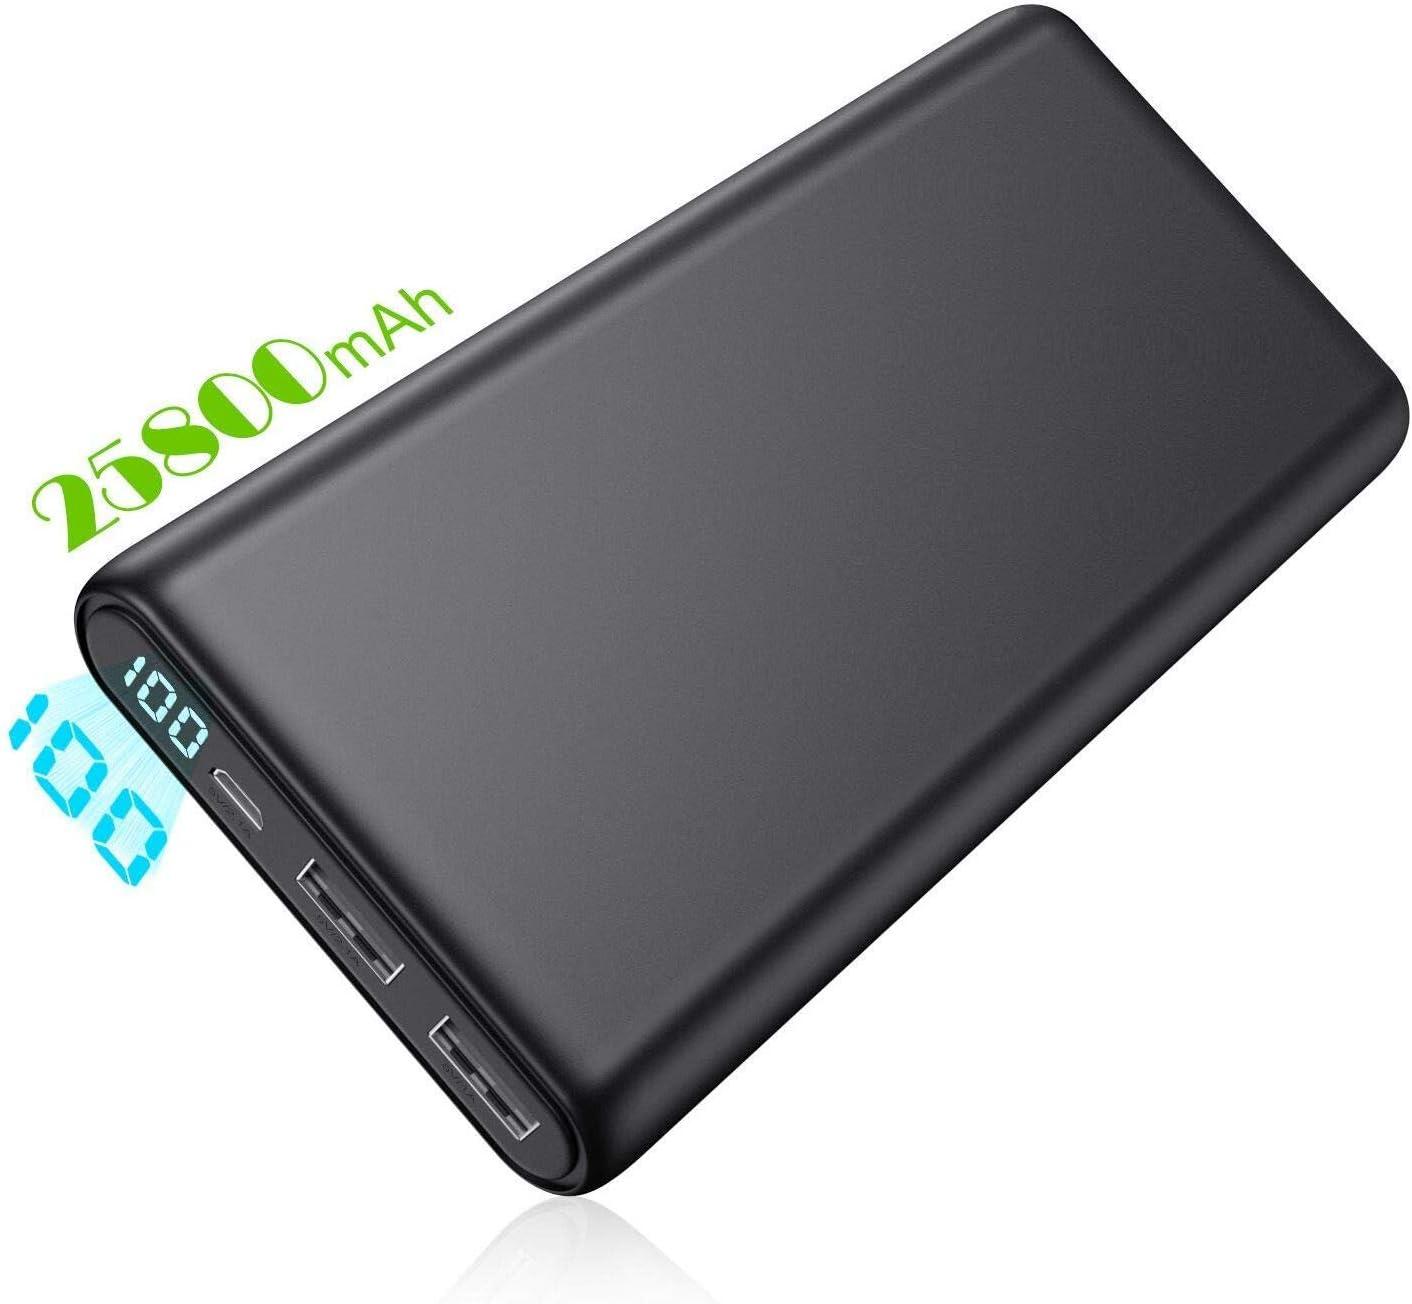 Trswyop Power Bank, Caricabatterie Portatile 25800mAh【100% -0 Display Digitale a...